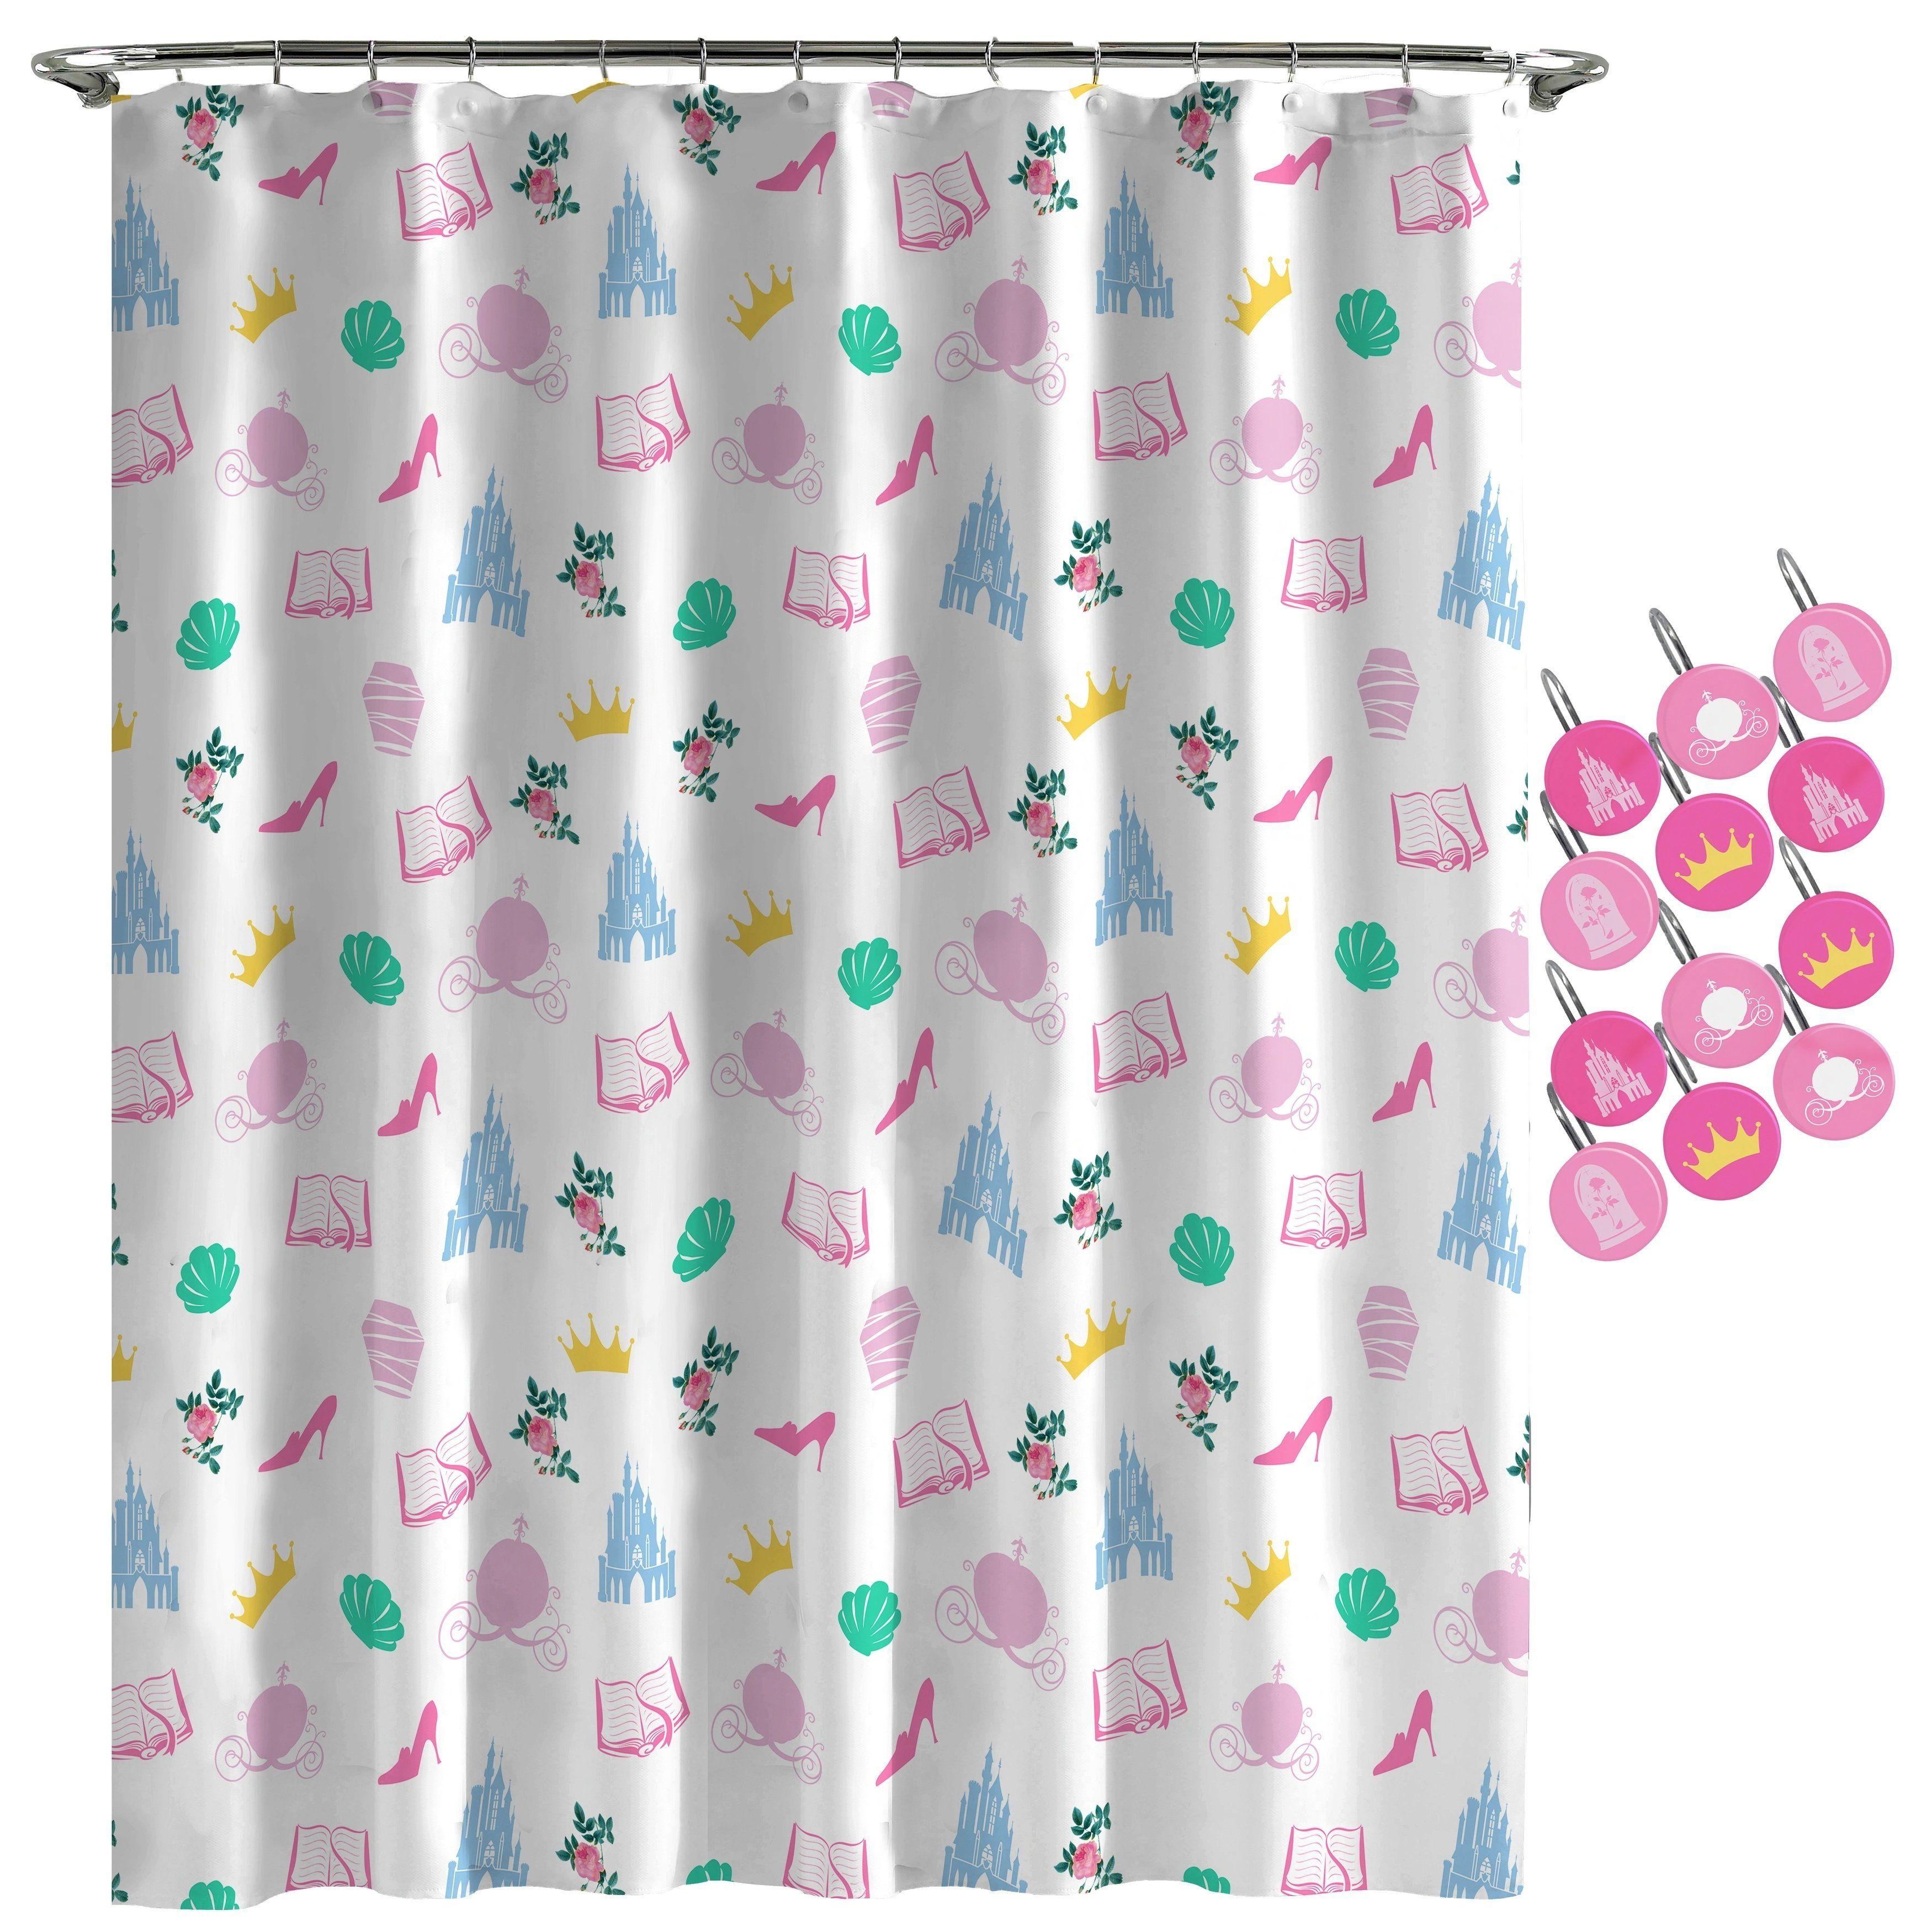 Disney Princess Sassy White Shower Curtain And Hooks Disney